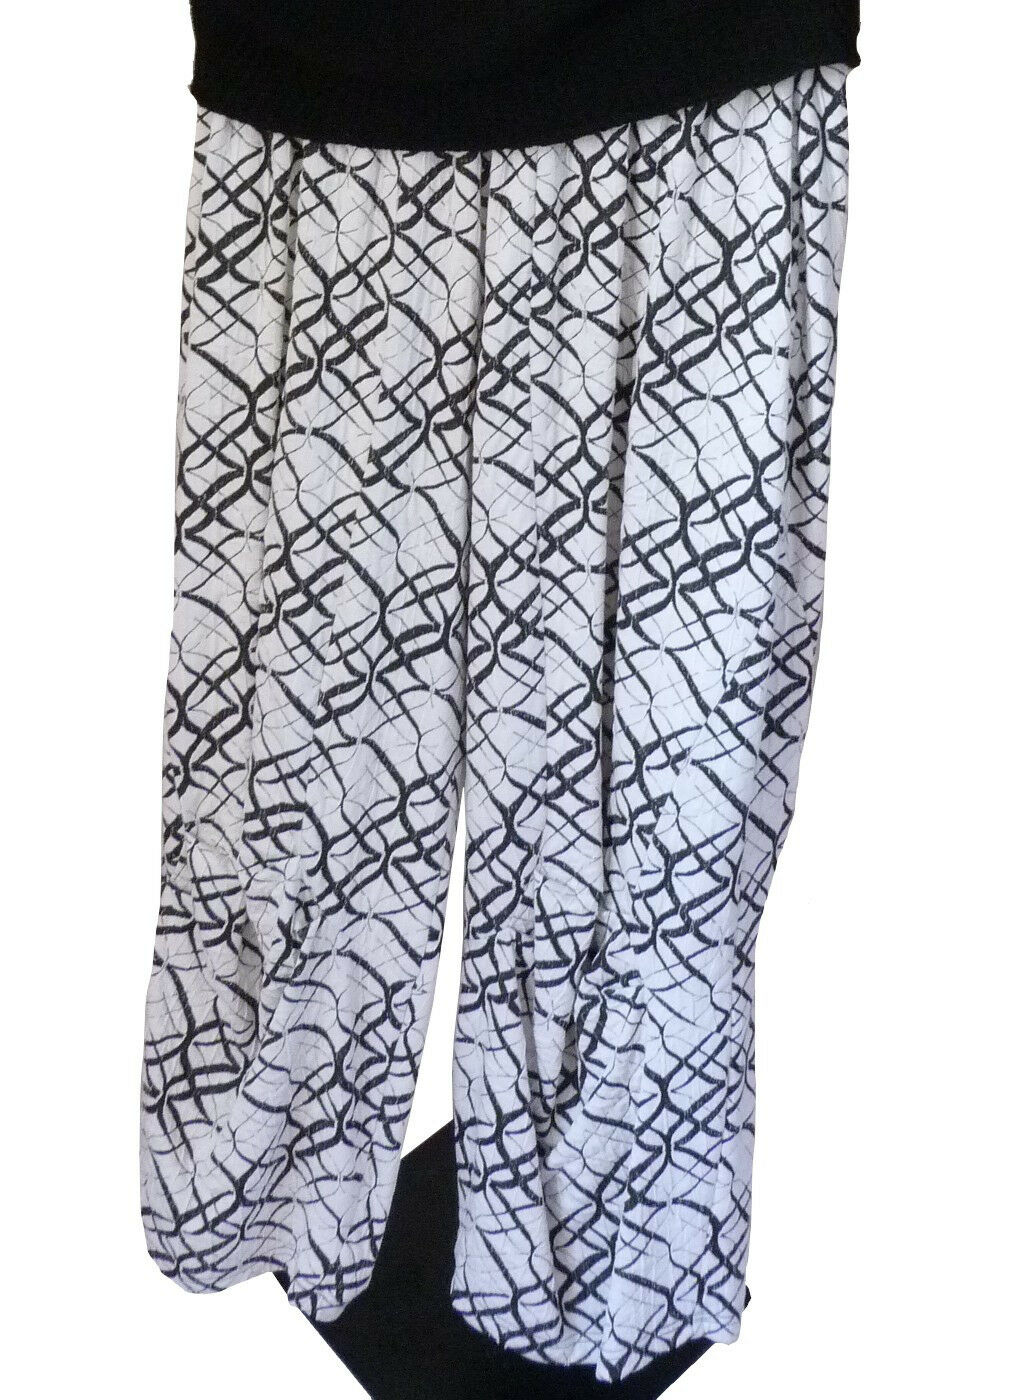 Lagenlook Leins´ Hose Marlenehose Schlupfhose pants Weiss black Gr.M L XL XXL